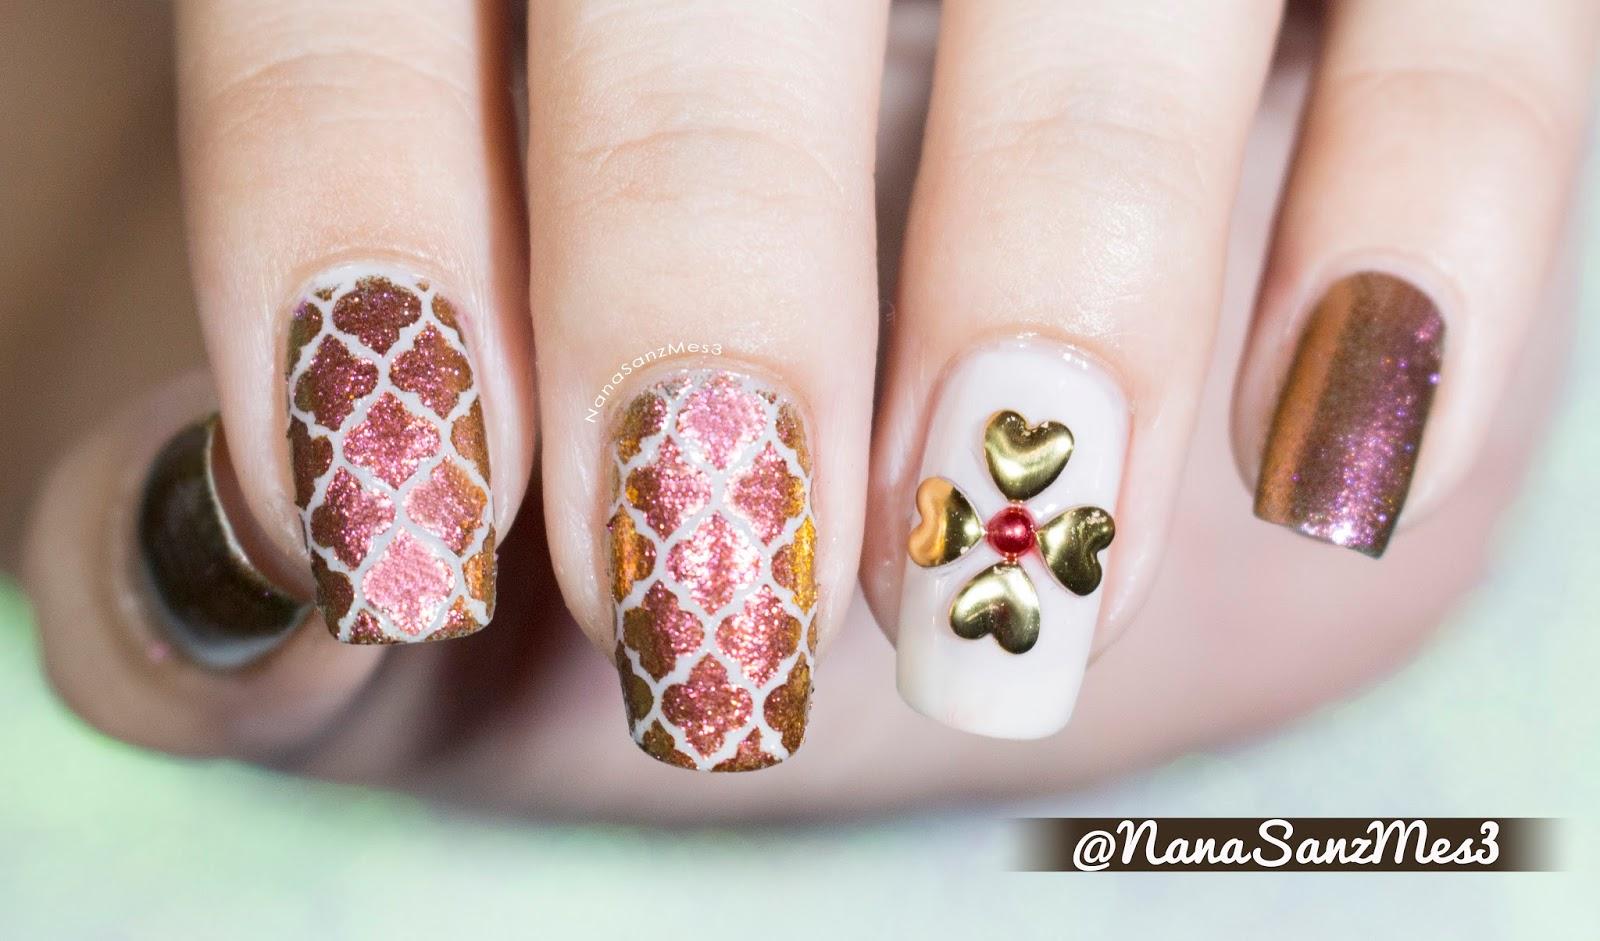 NanaSanzMes3: Holo Moroccan nails